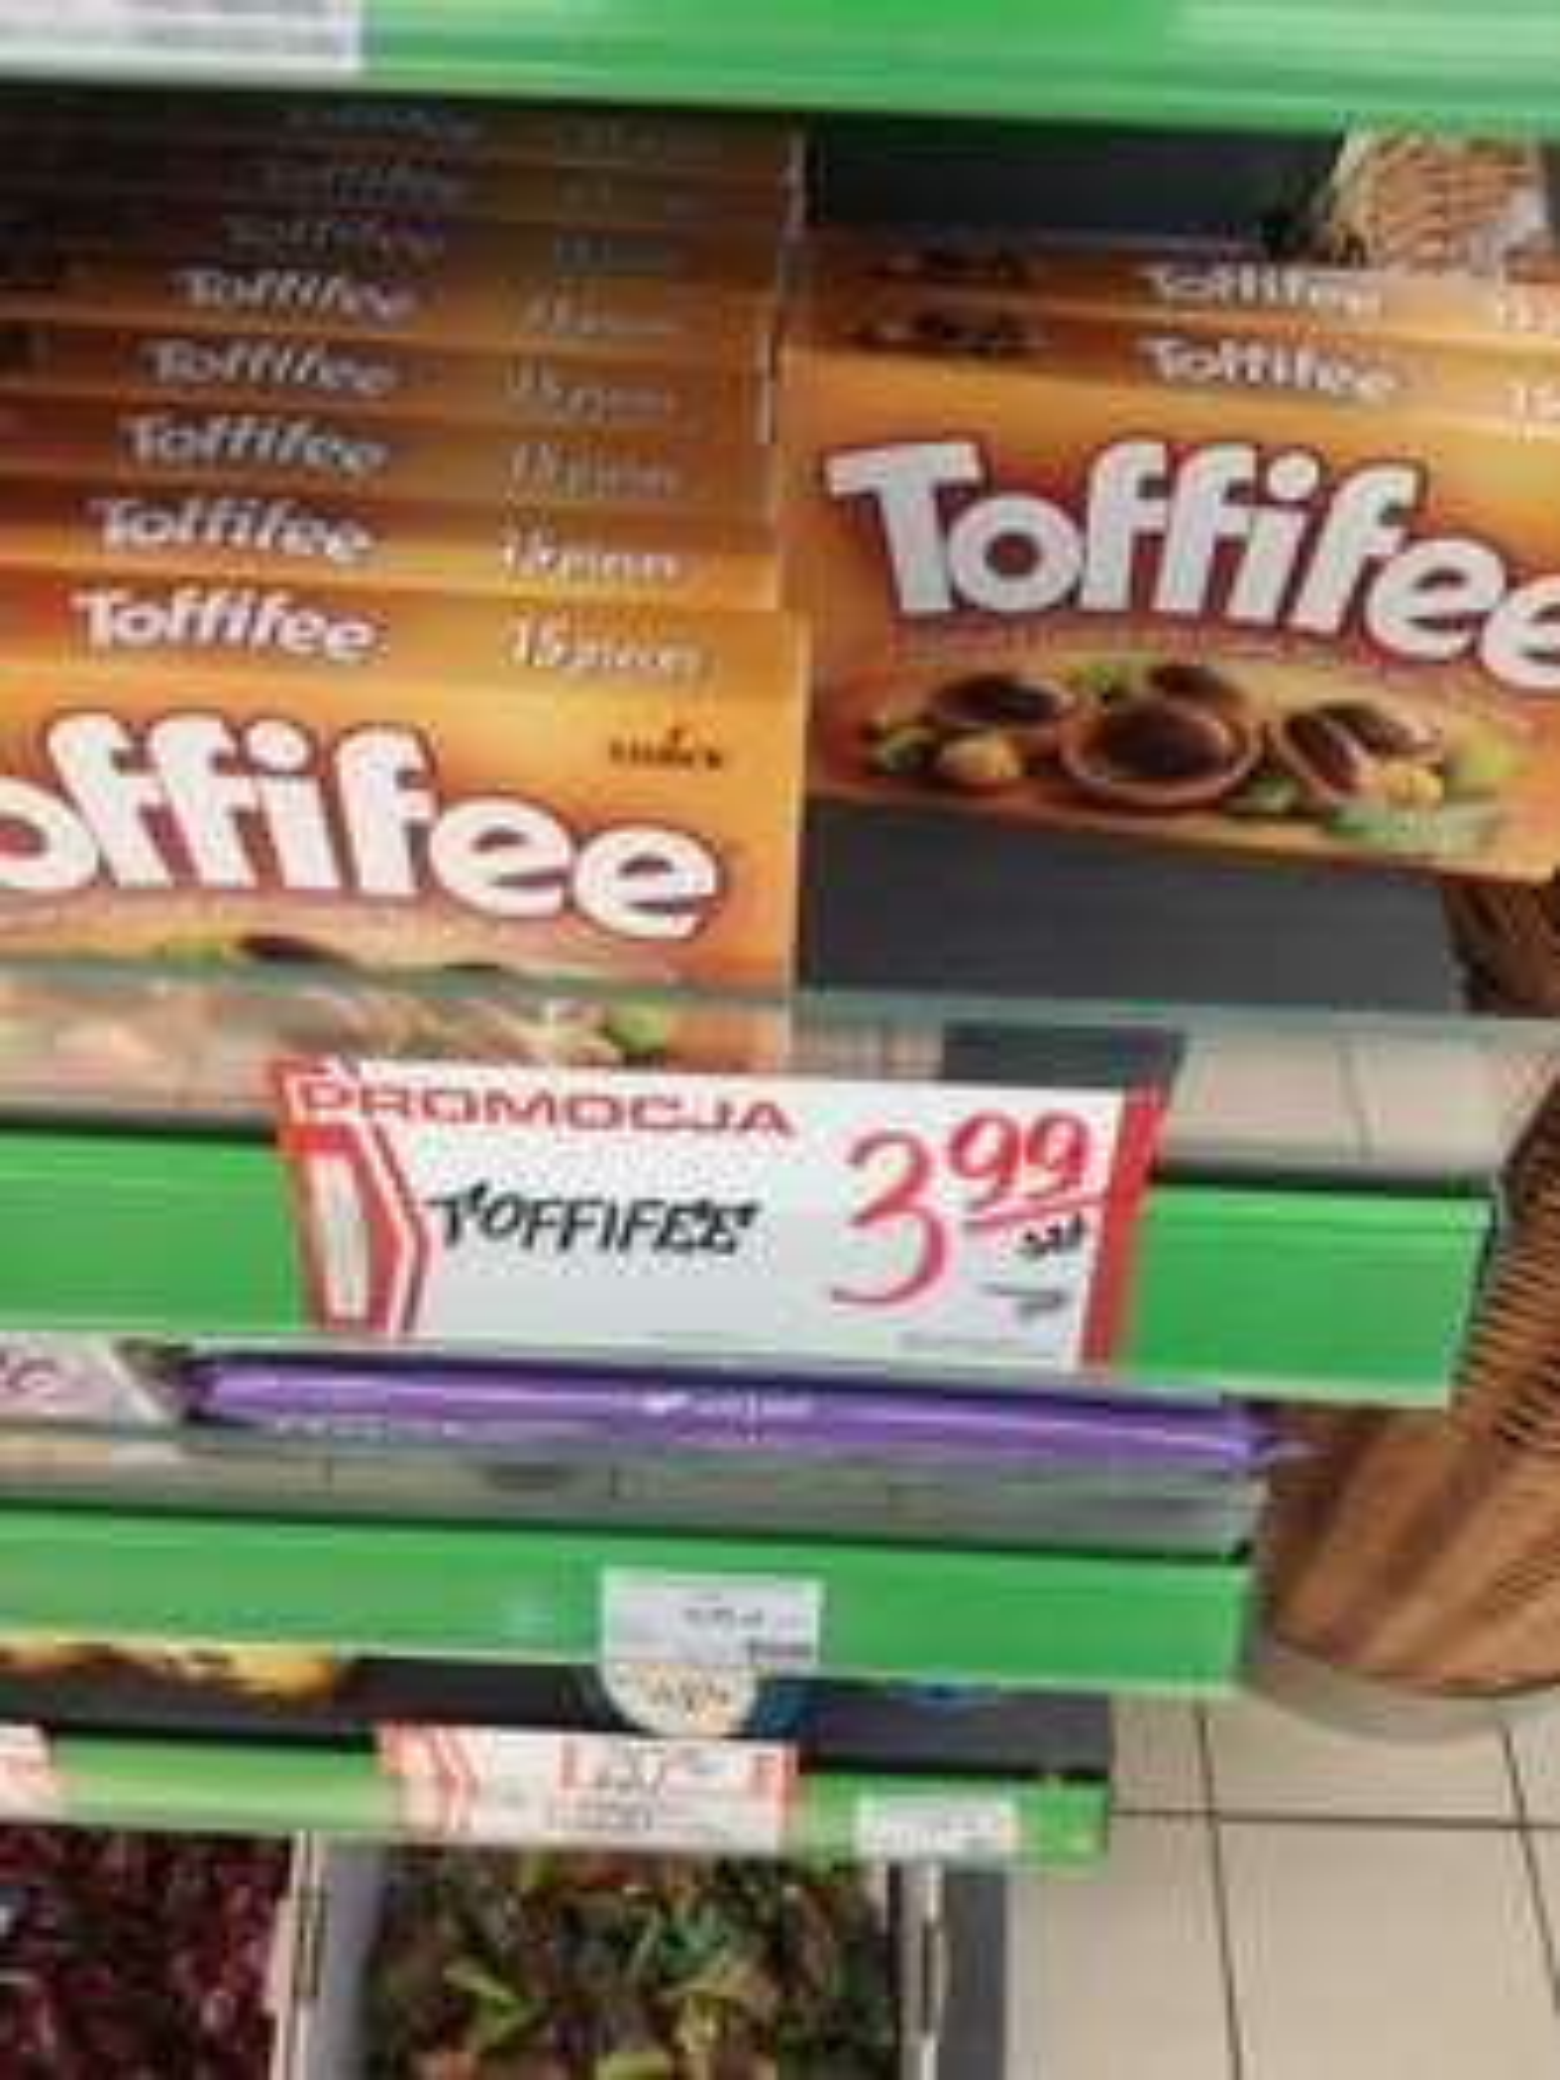 Toffifee 125g. Extra promocja Delikatesy Centrum